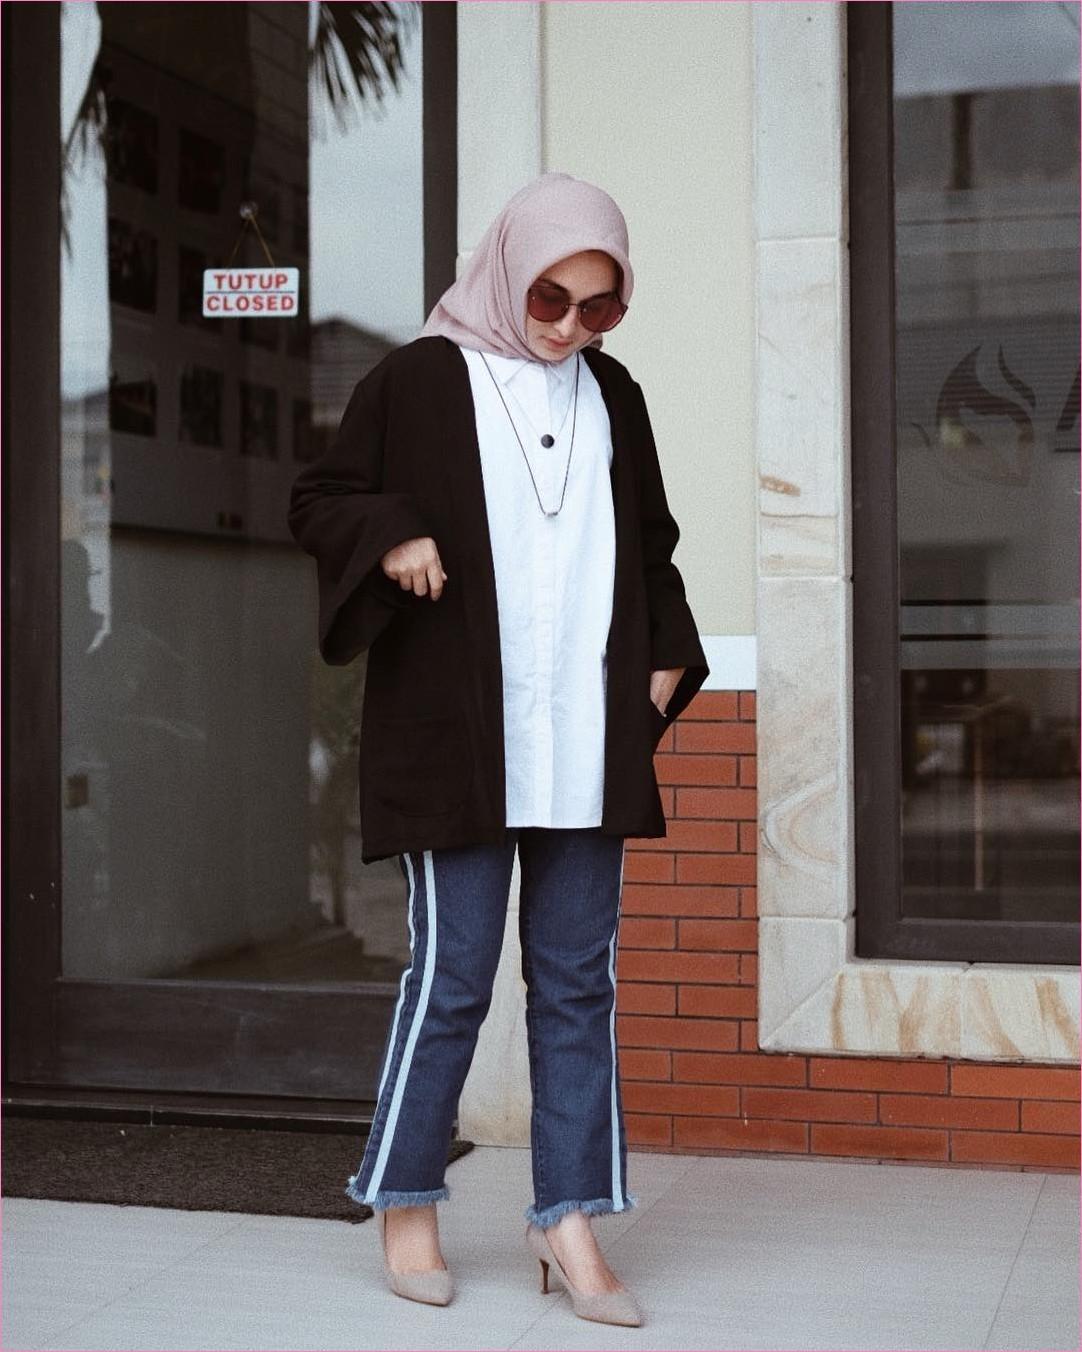 Outfit Baju Hijab Casual Untuk Kuliah Ala Selebgram 2018 hijab square kerudung segiempat high heels wedges krem muda jeans pallazo cullotes seobek denim top blouse kemeja cardigan hitam putih kalung kacamata coklat gaya casual kain aktun sutra rayon ootd outfit 2018 selebgram kaca